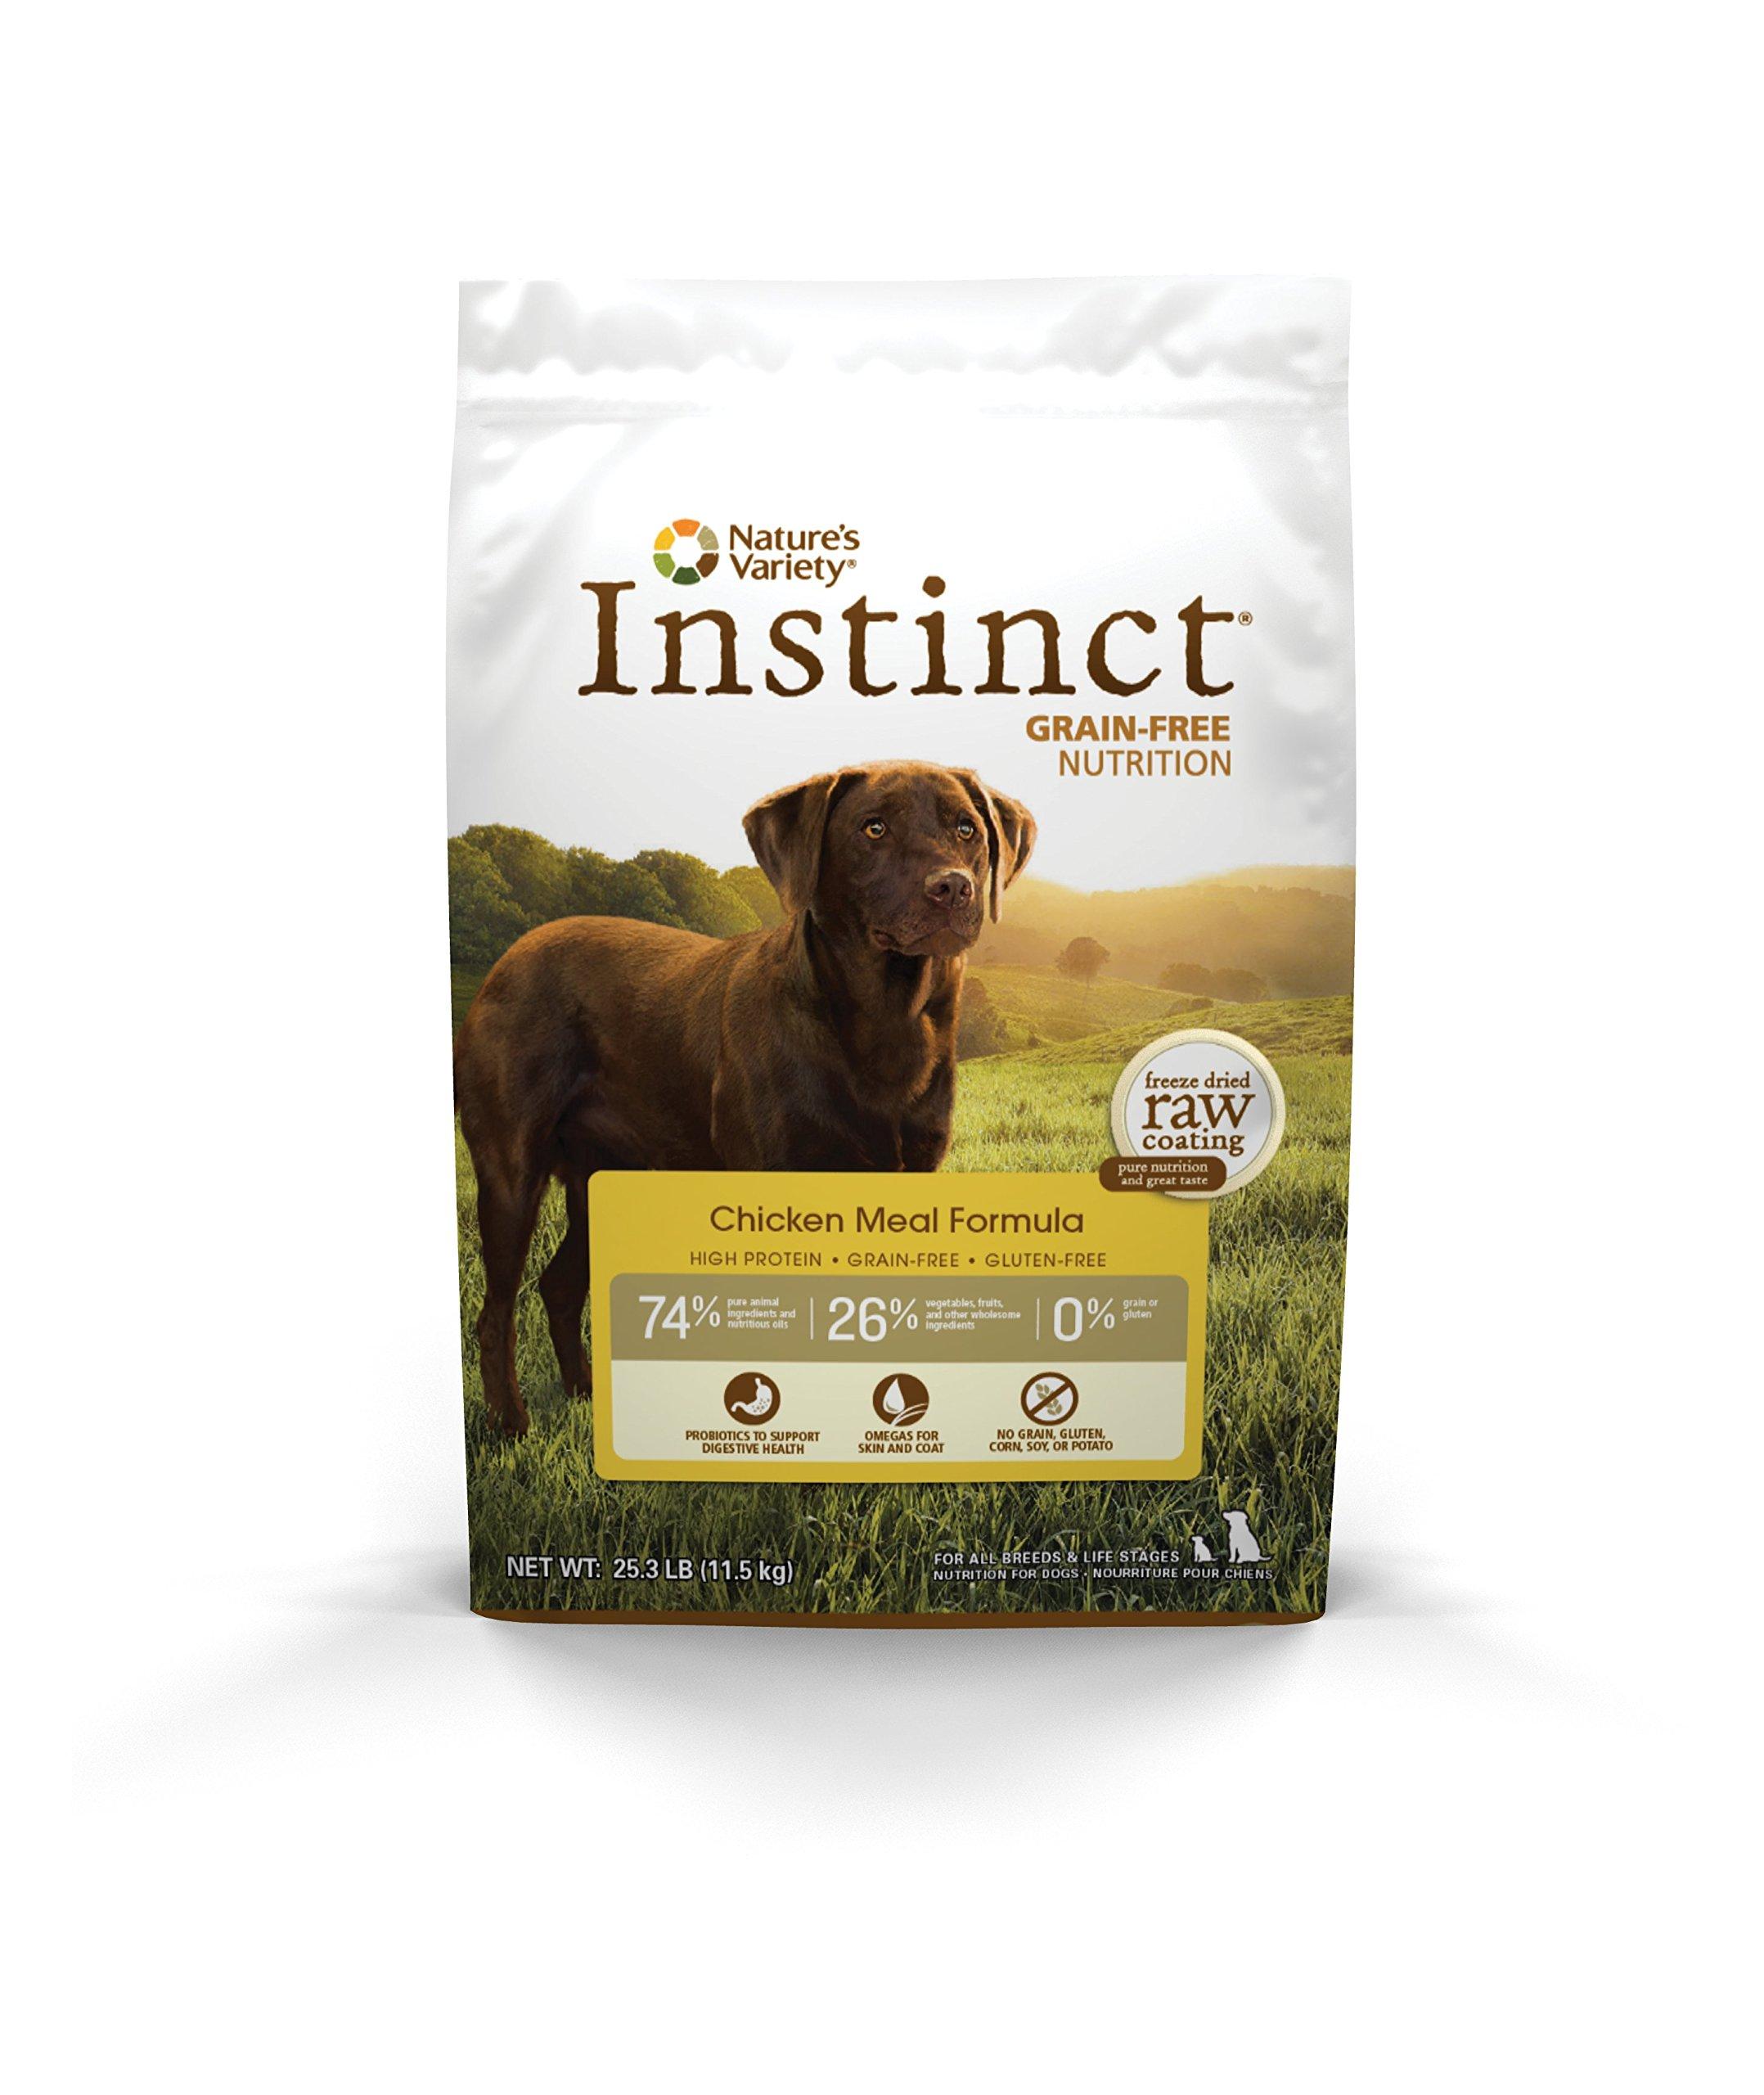 Instinct Original Grain Free Chicken Meal Formula Natural Dry Dog Food by Nature's Variety, 25.3 lb. Bag